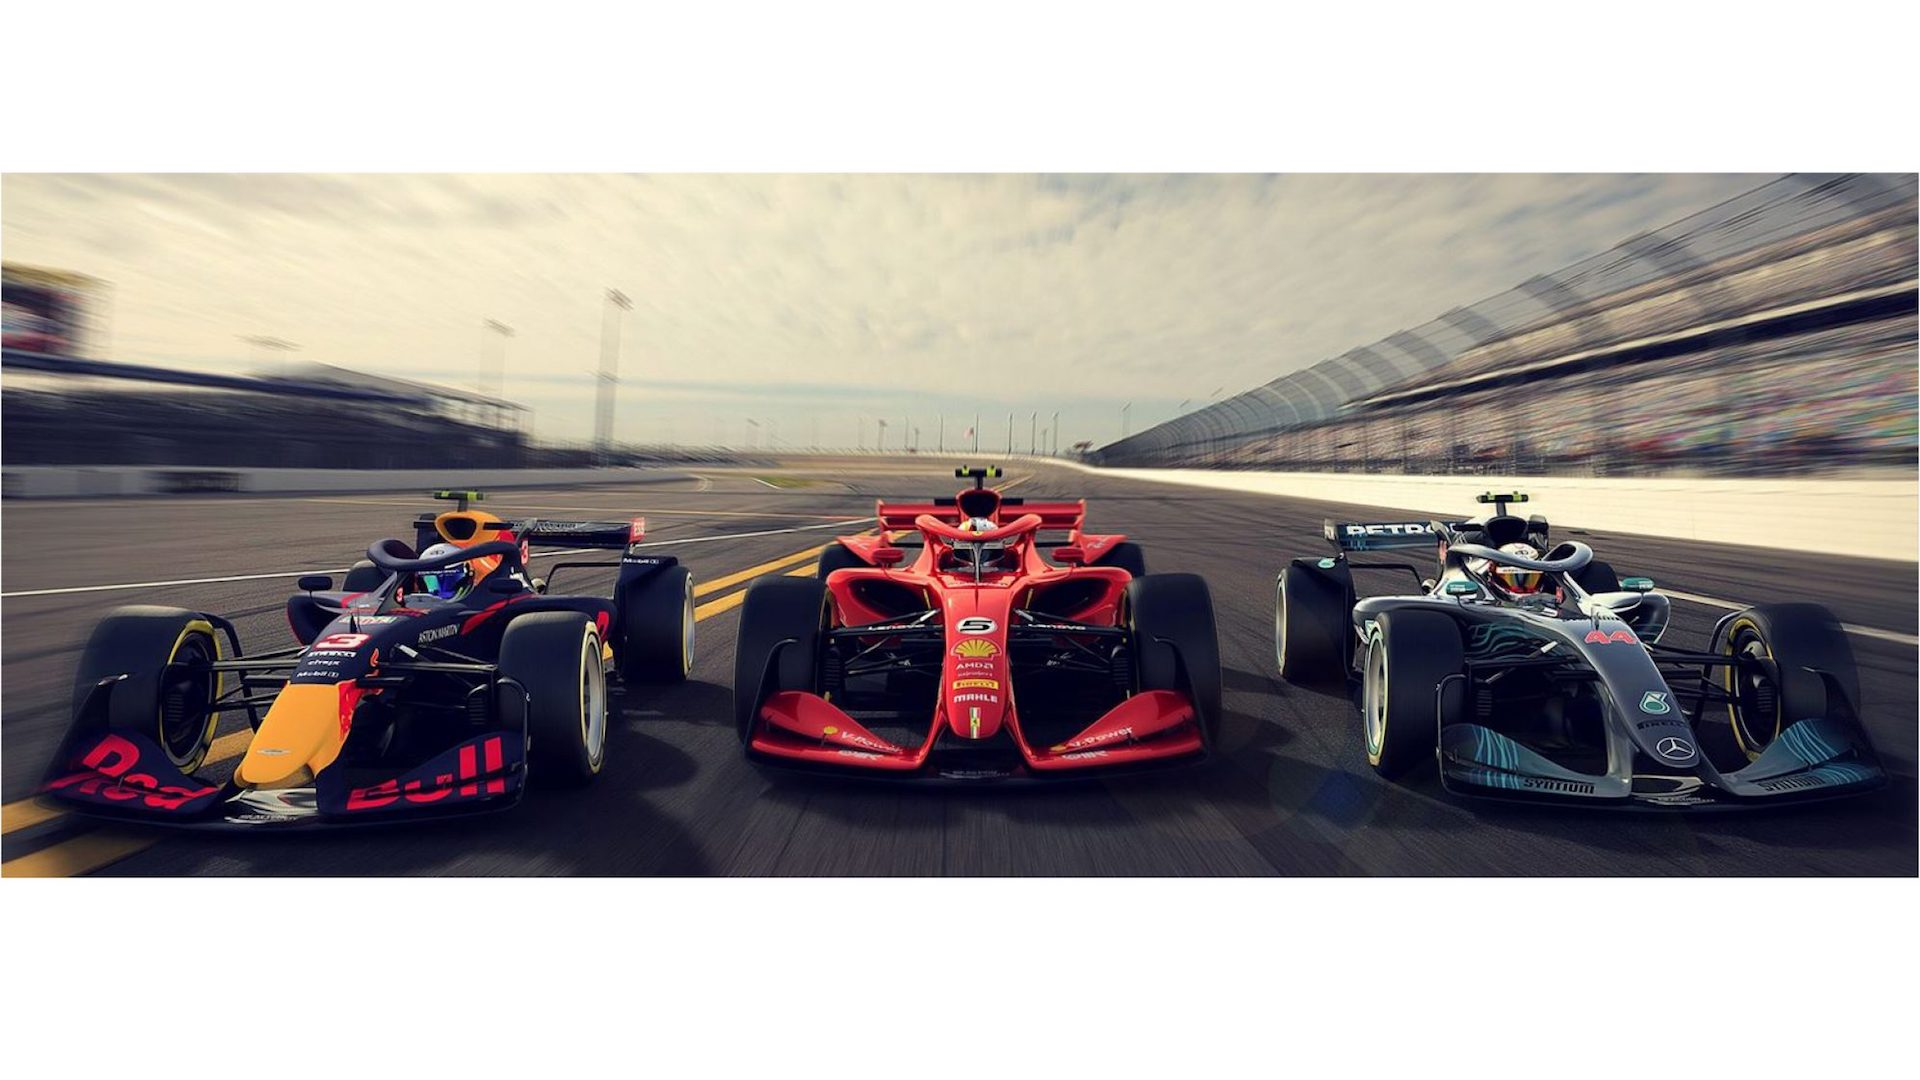 2021 F1 Car Design Proposals Focus On Aerodynamics For Better Racing